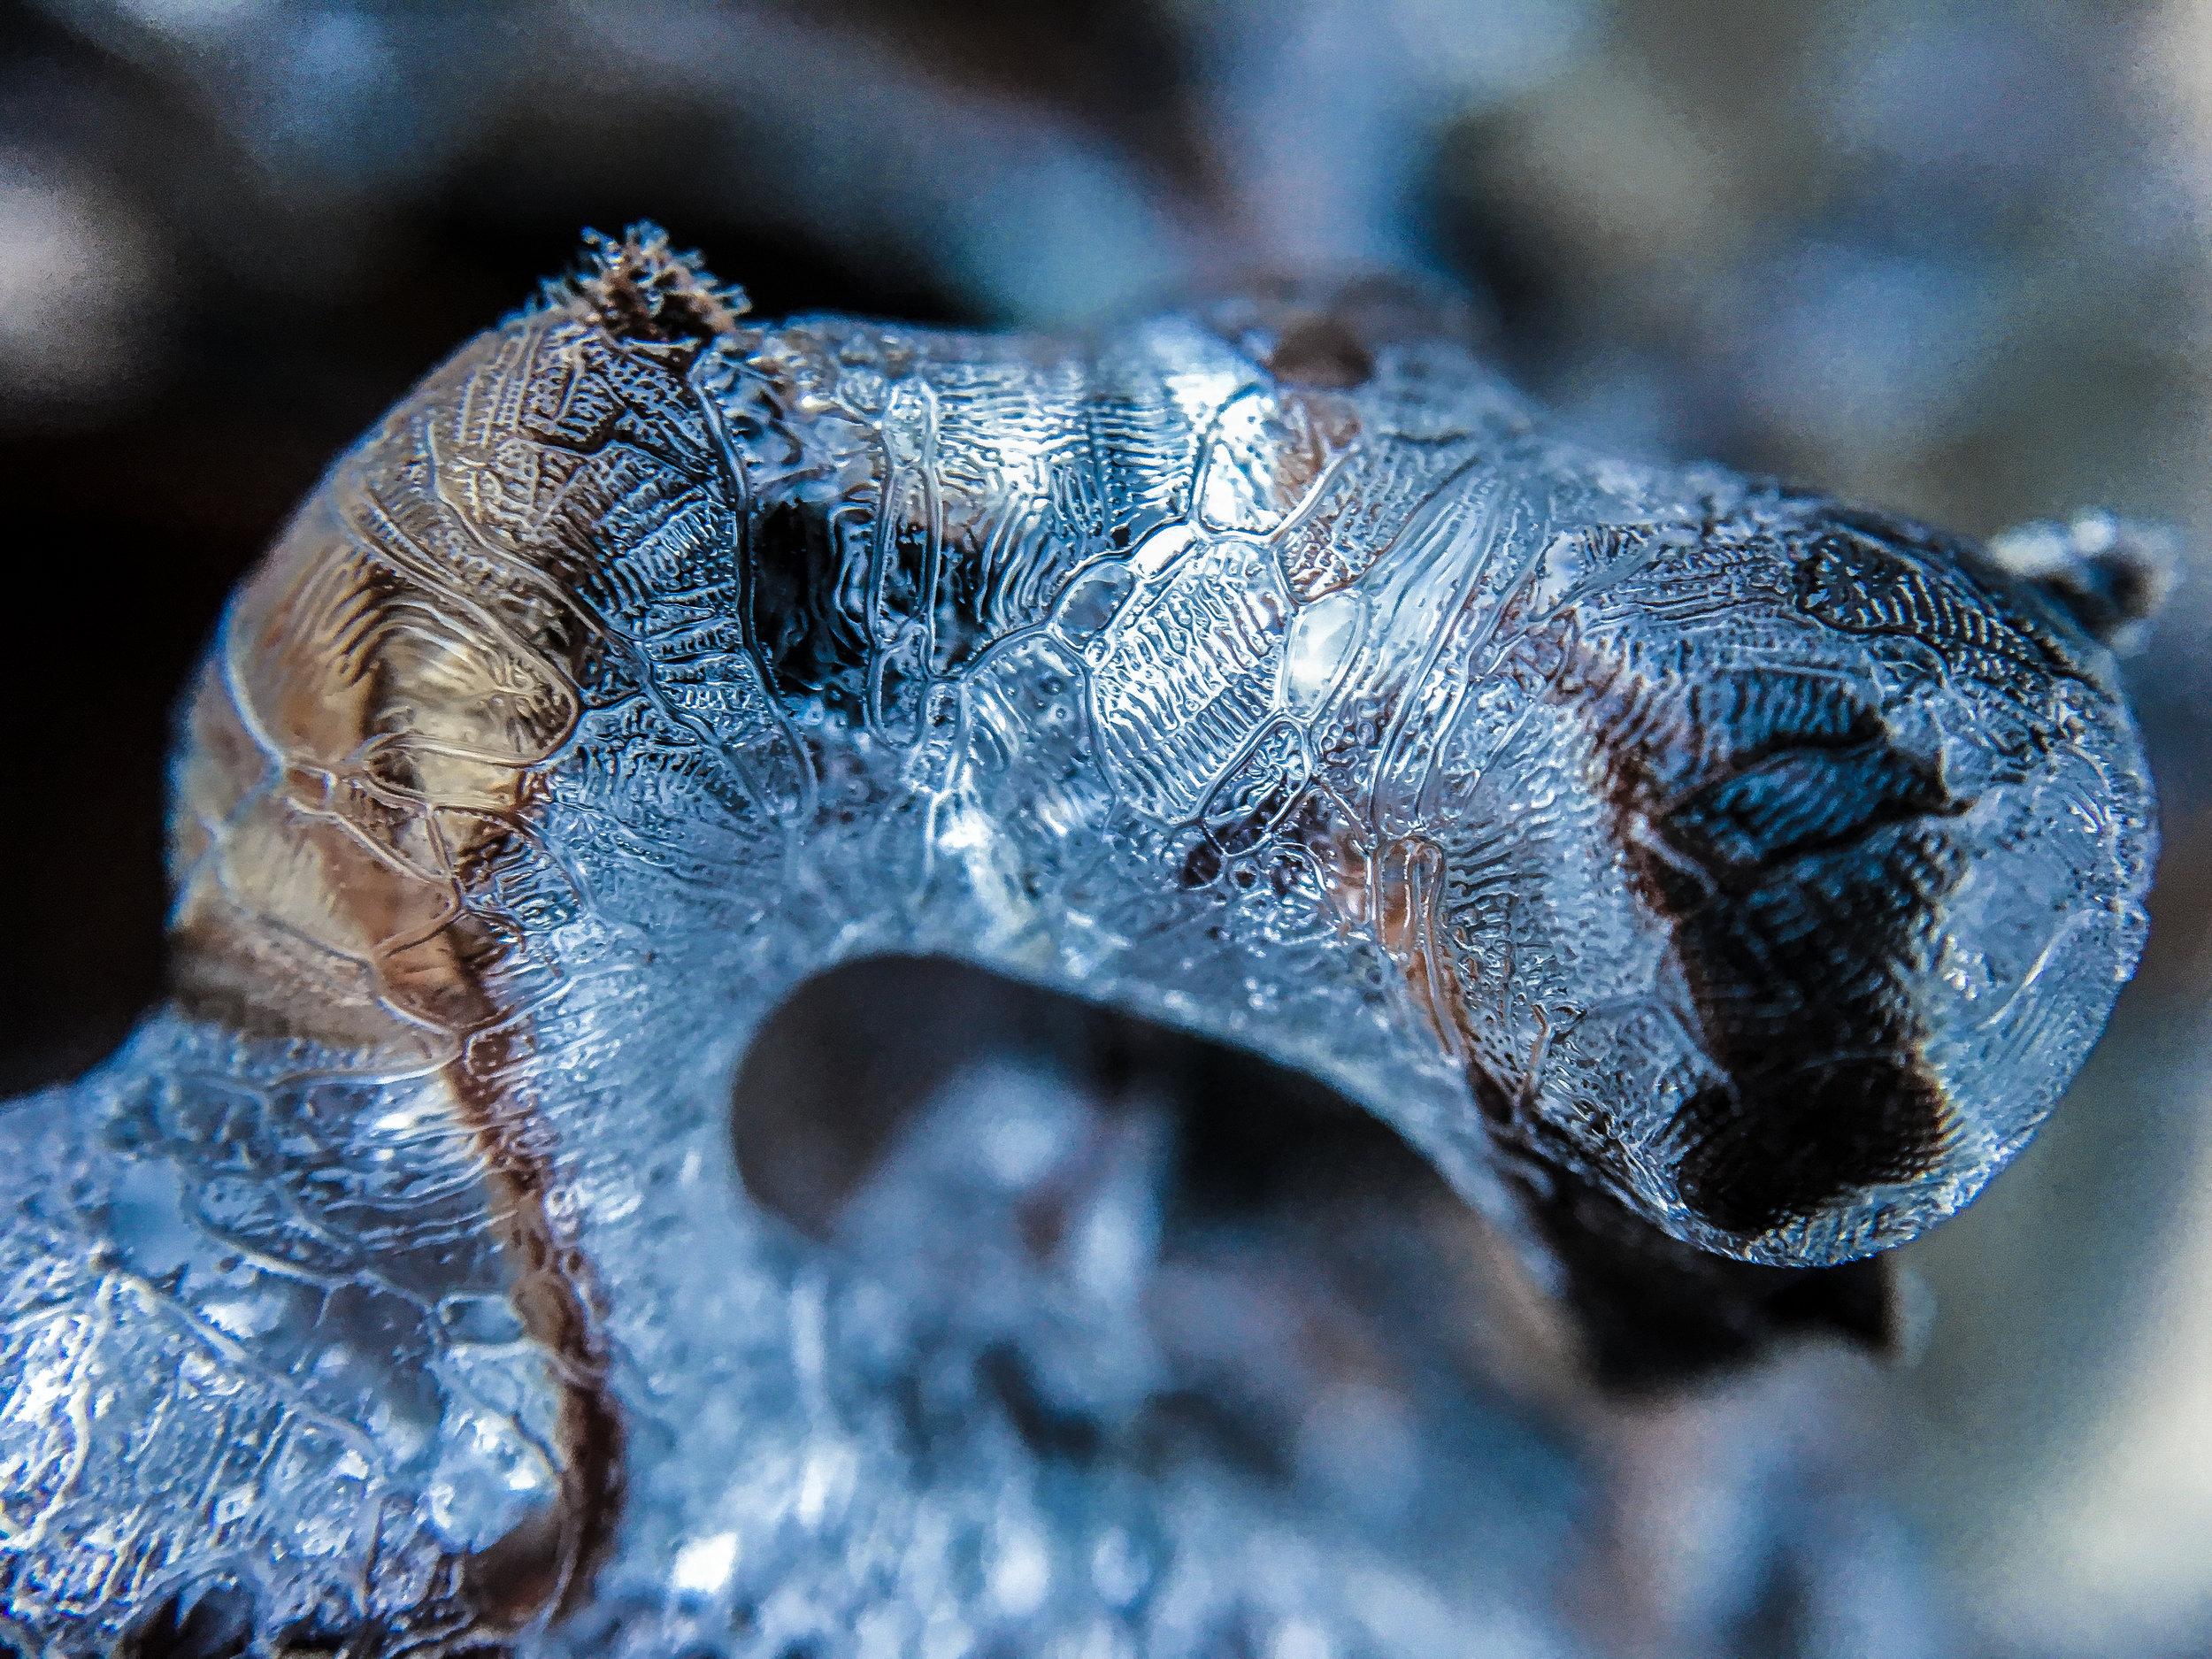 Icestorm2017-11.jpg